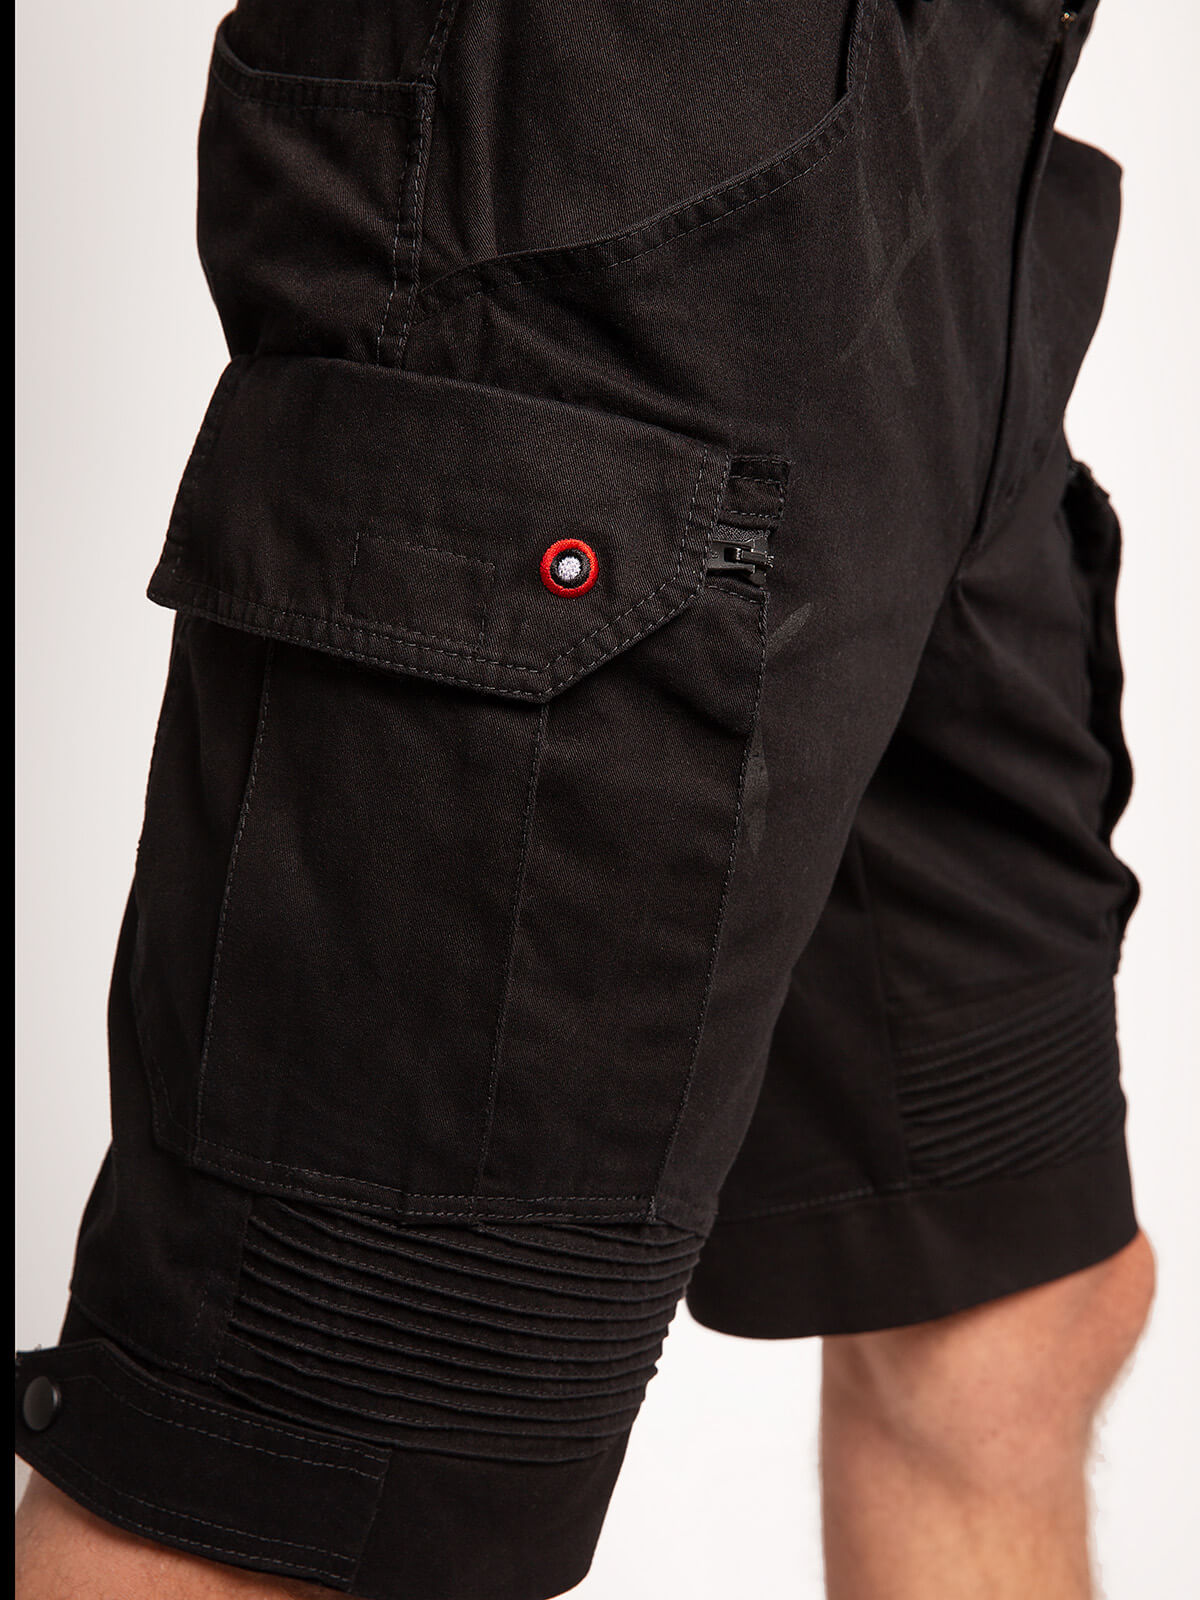 Men's Shorts Flyer. Color black. 4.